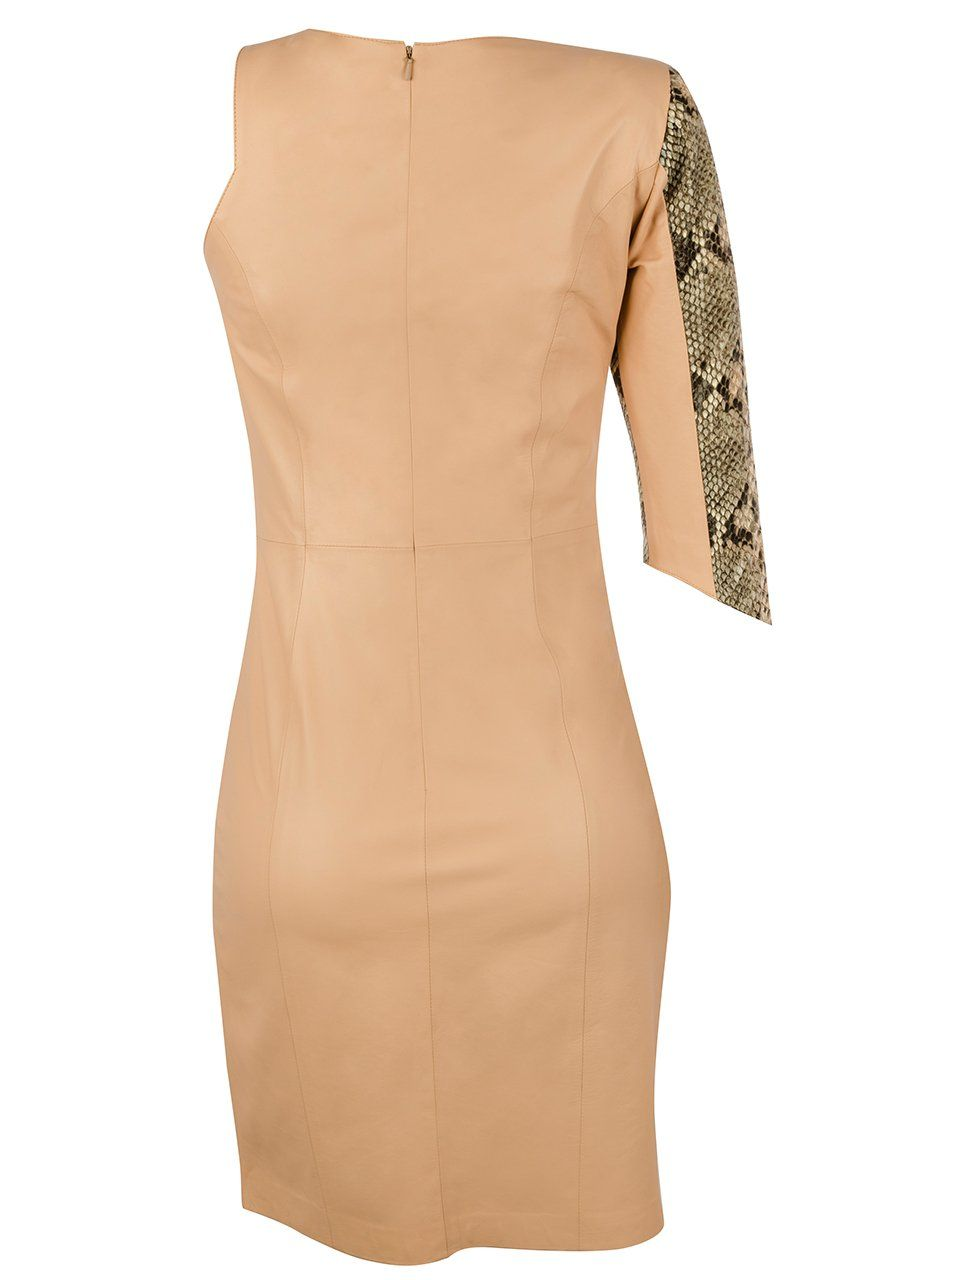 Vestido Monomanga em Pyton - Liziane Richter